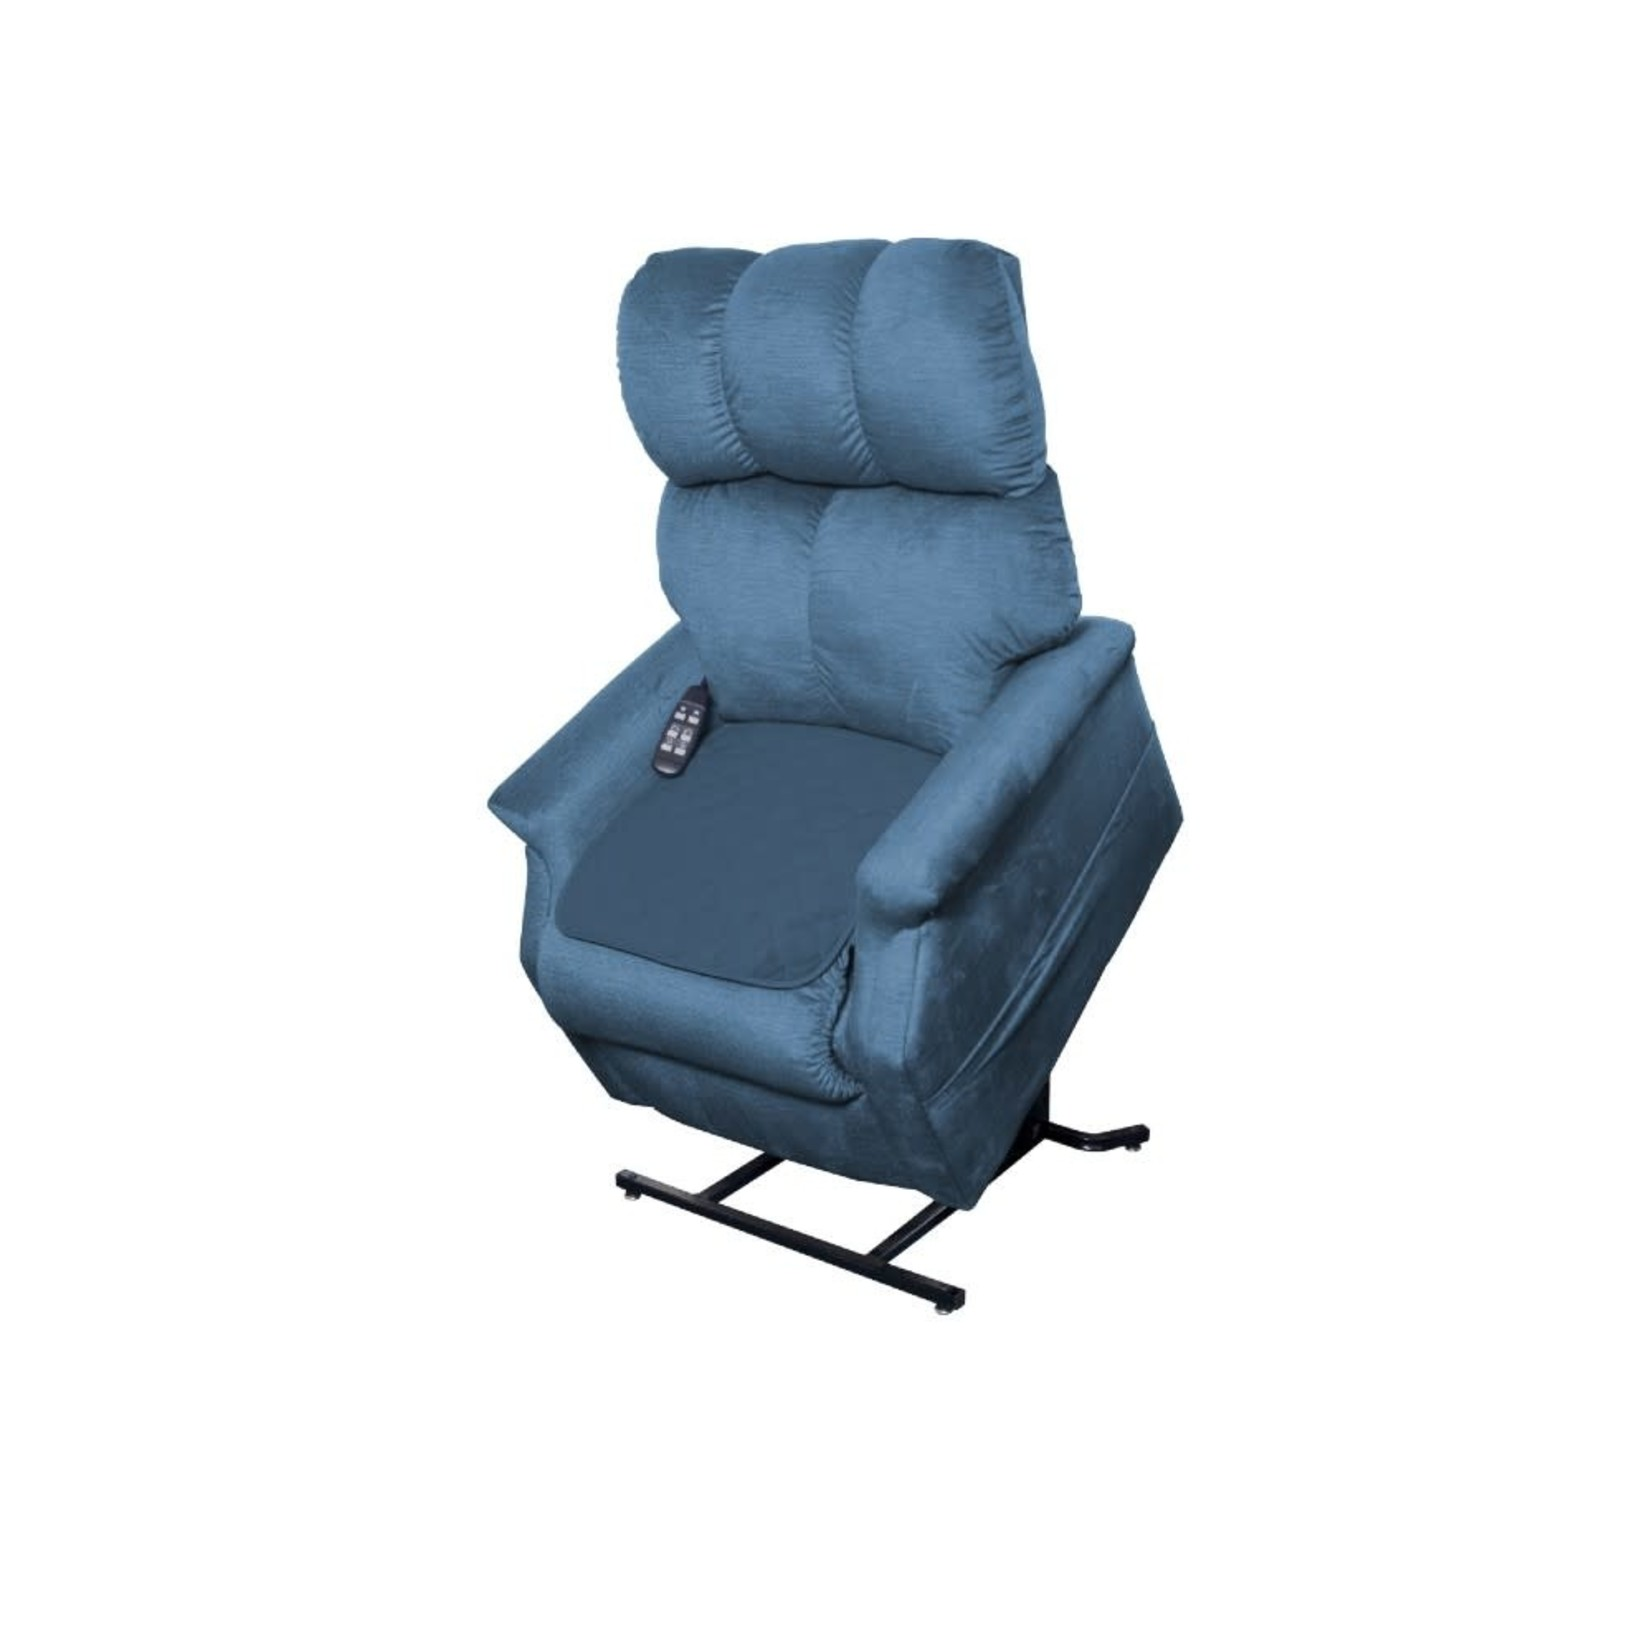 Essential Medical Furniture pad 20x20 Blue